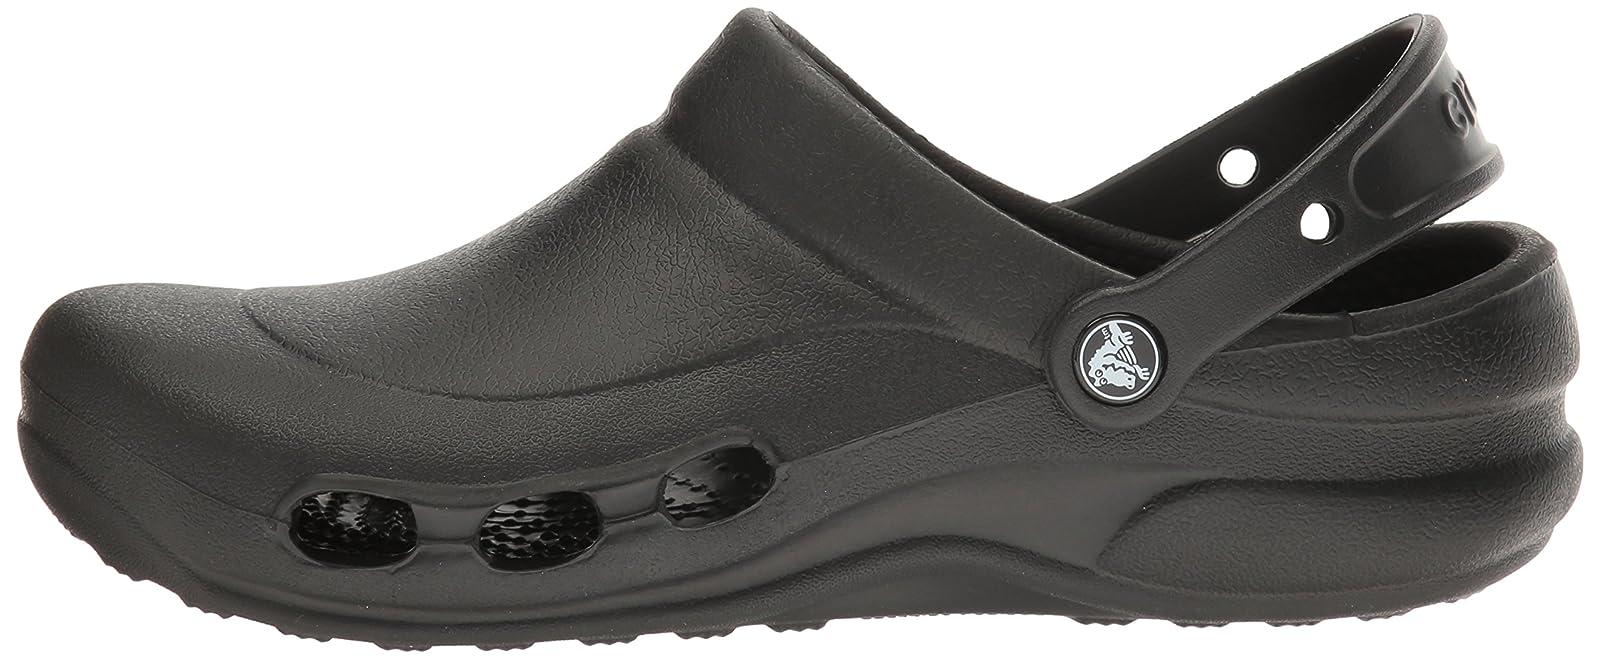 Crocs Unisex Specialist Vent Clog Black 11 10074M Black - 5